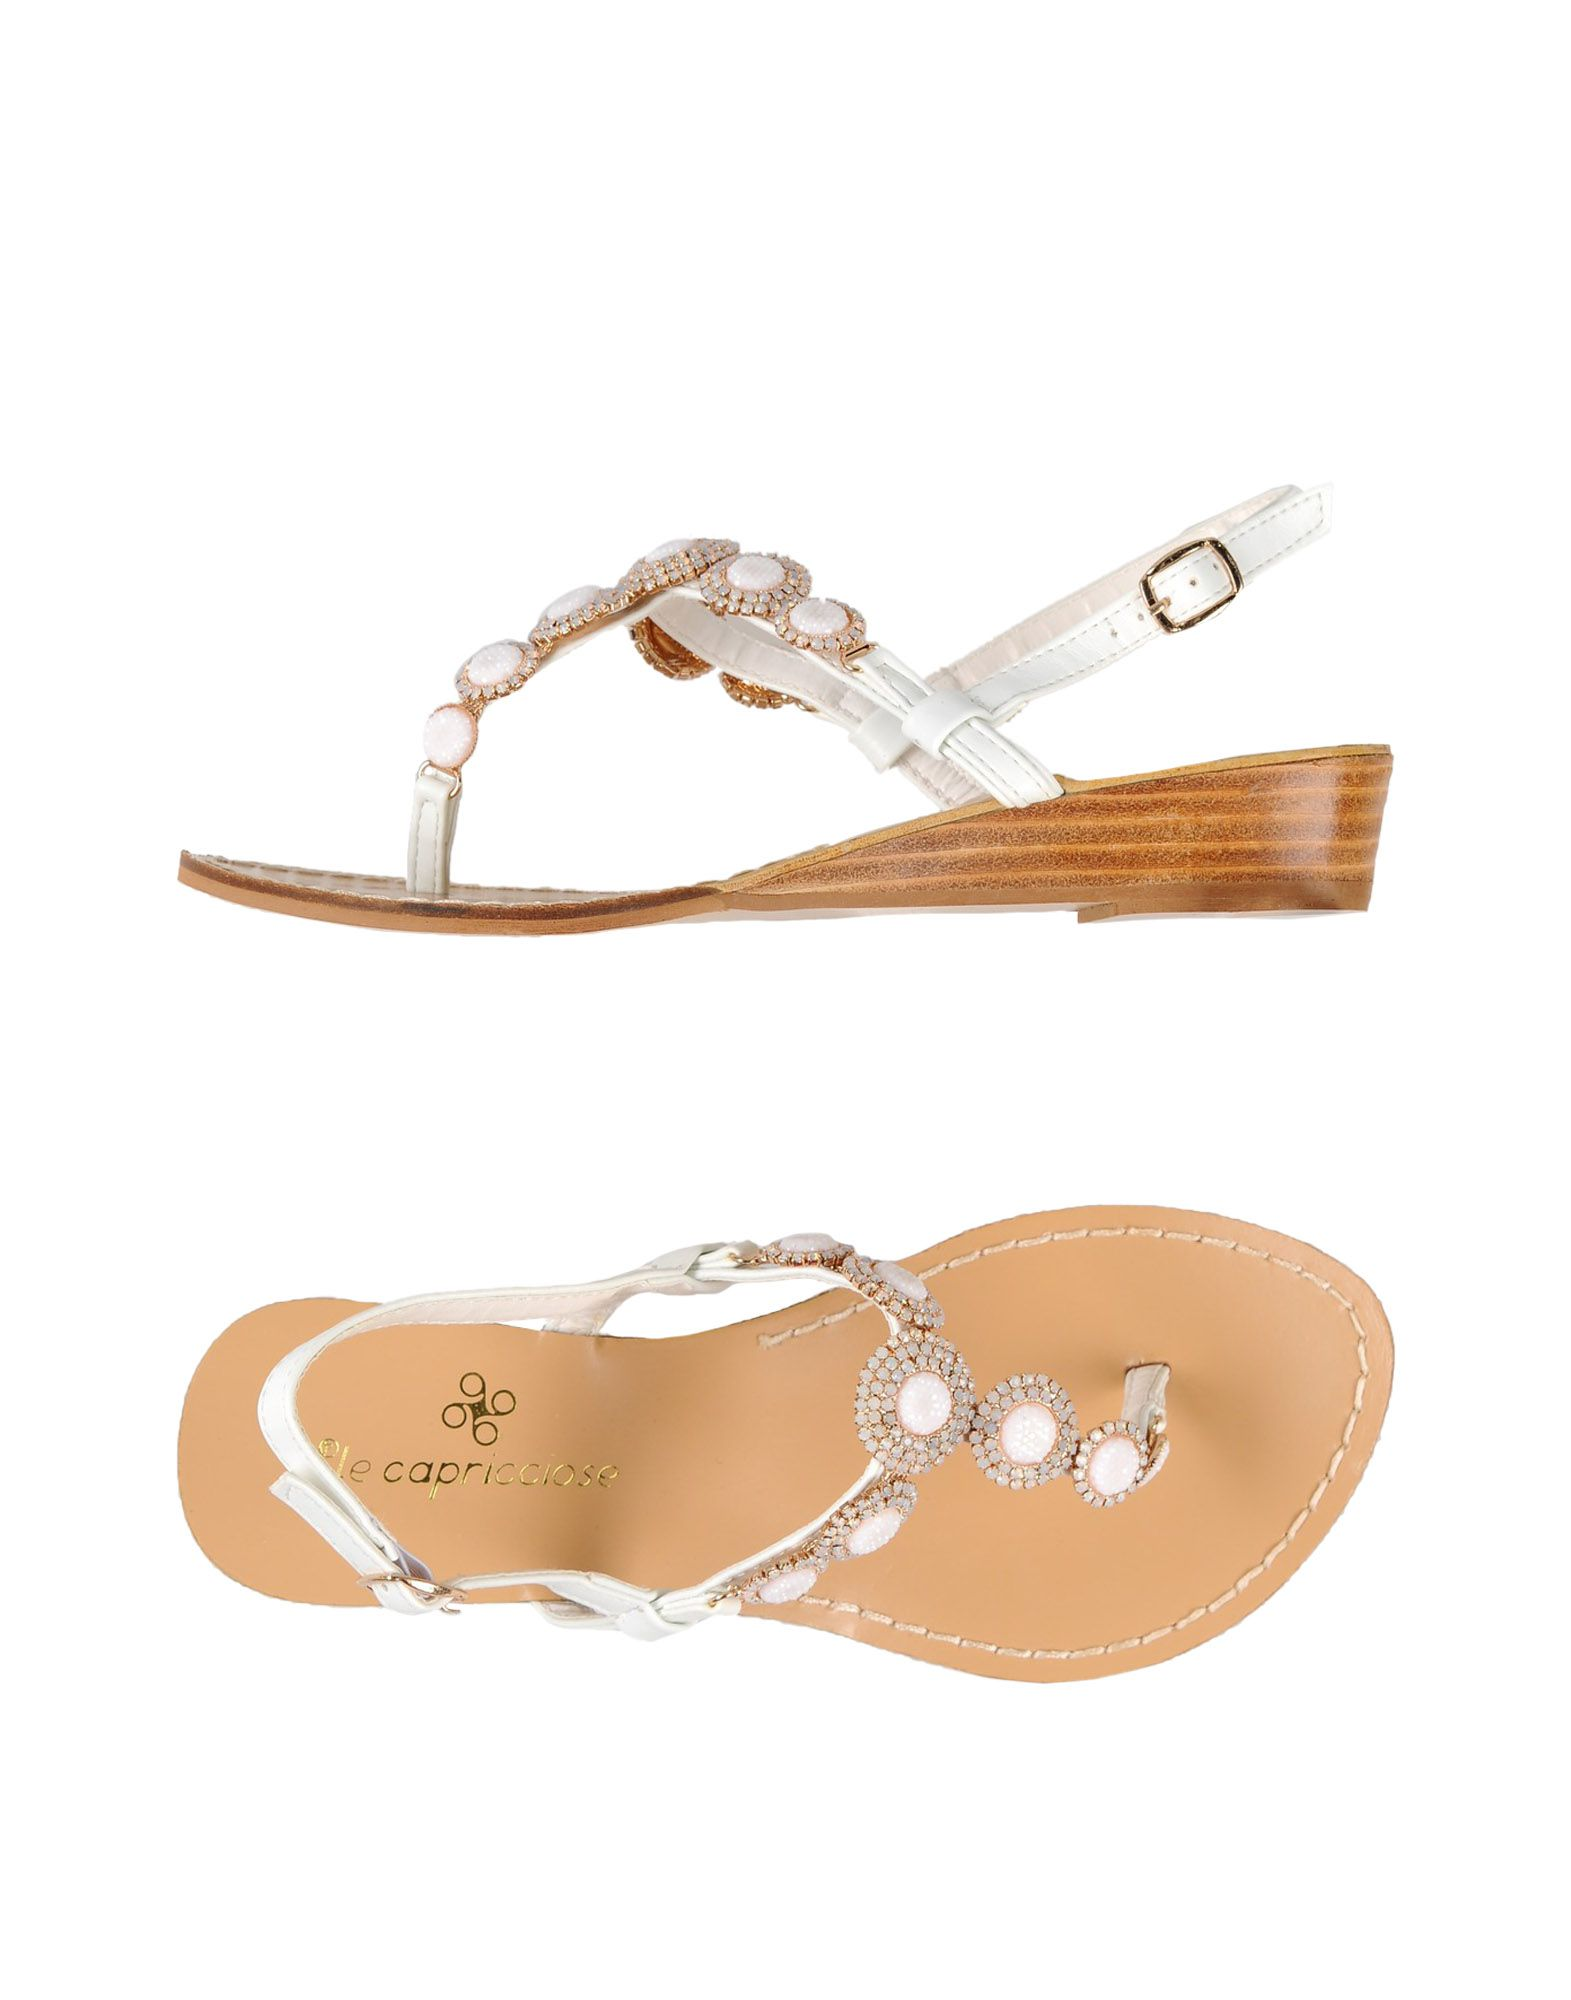 Le Capricciose® Dianetten Damen  11454469VN Gute Qualität beliebte Schuhe